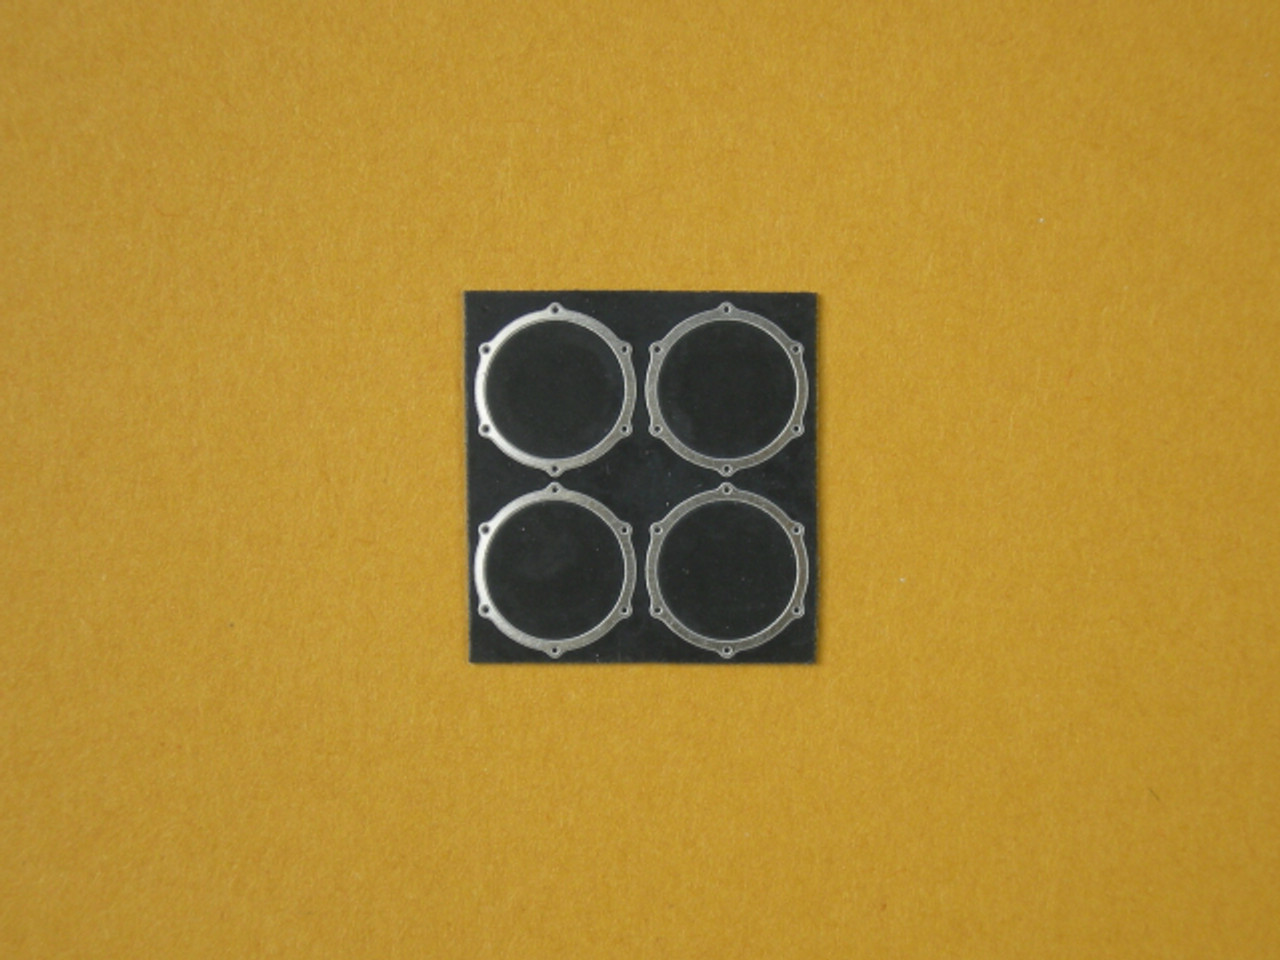 Round Window Bezels Pro Mod, etc 1/16